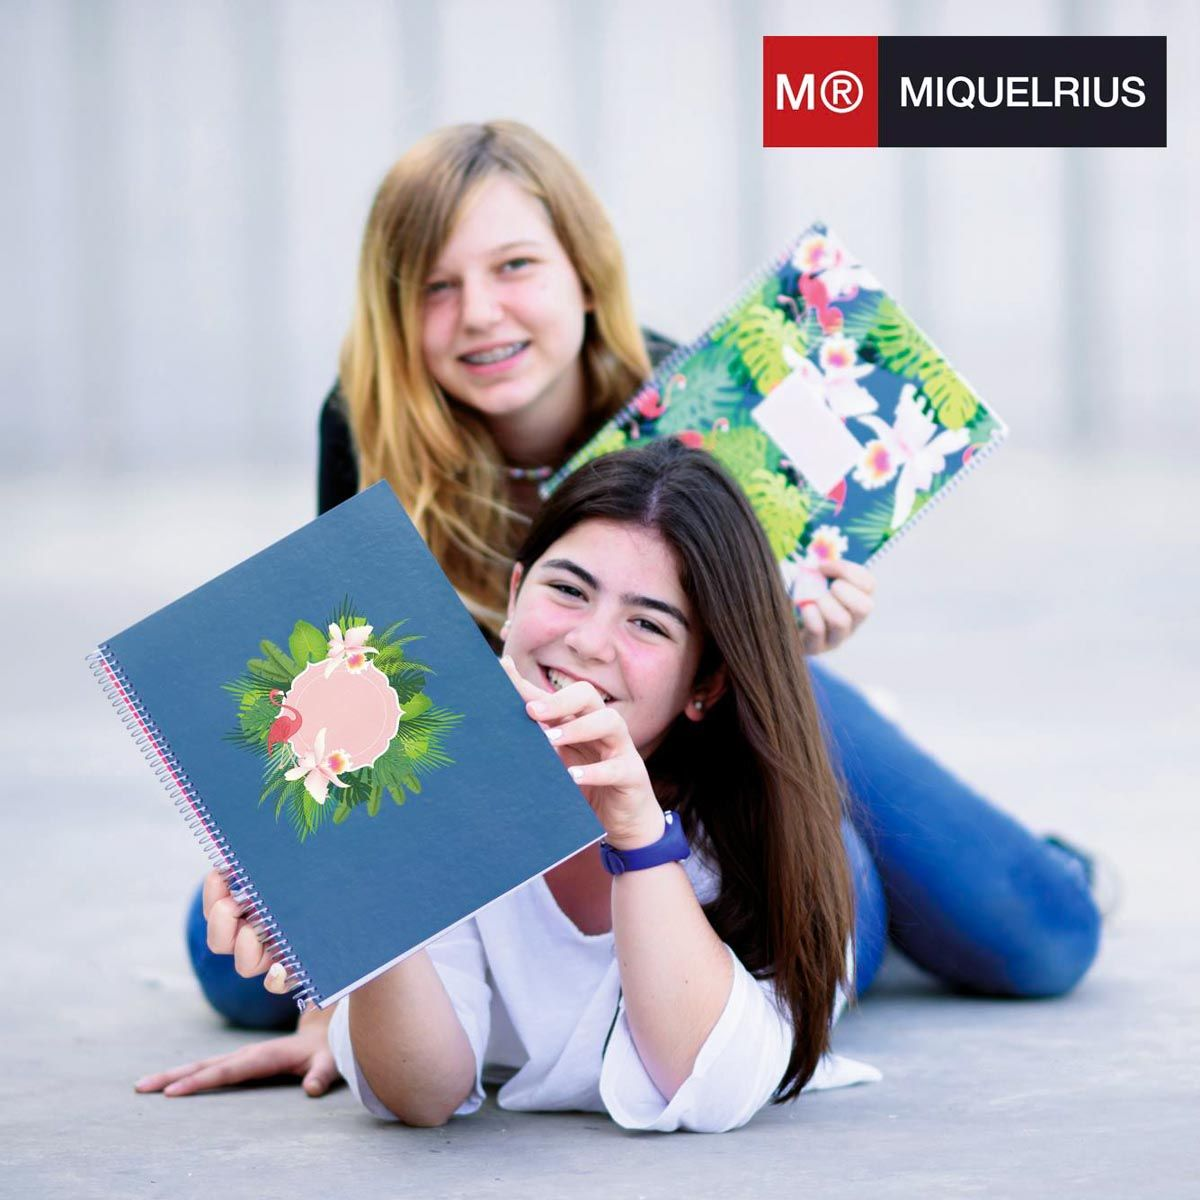 Miquelrius-Eva García Bernal